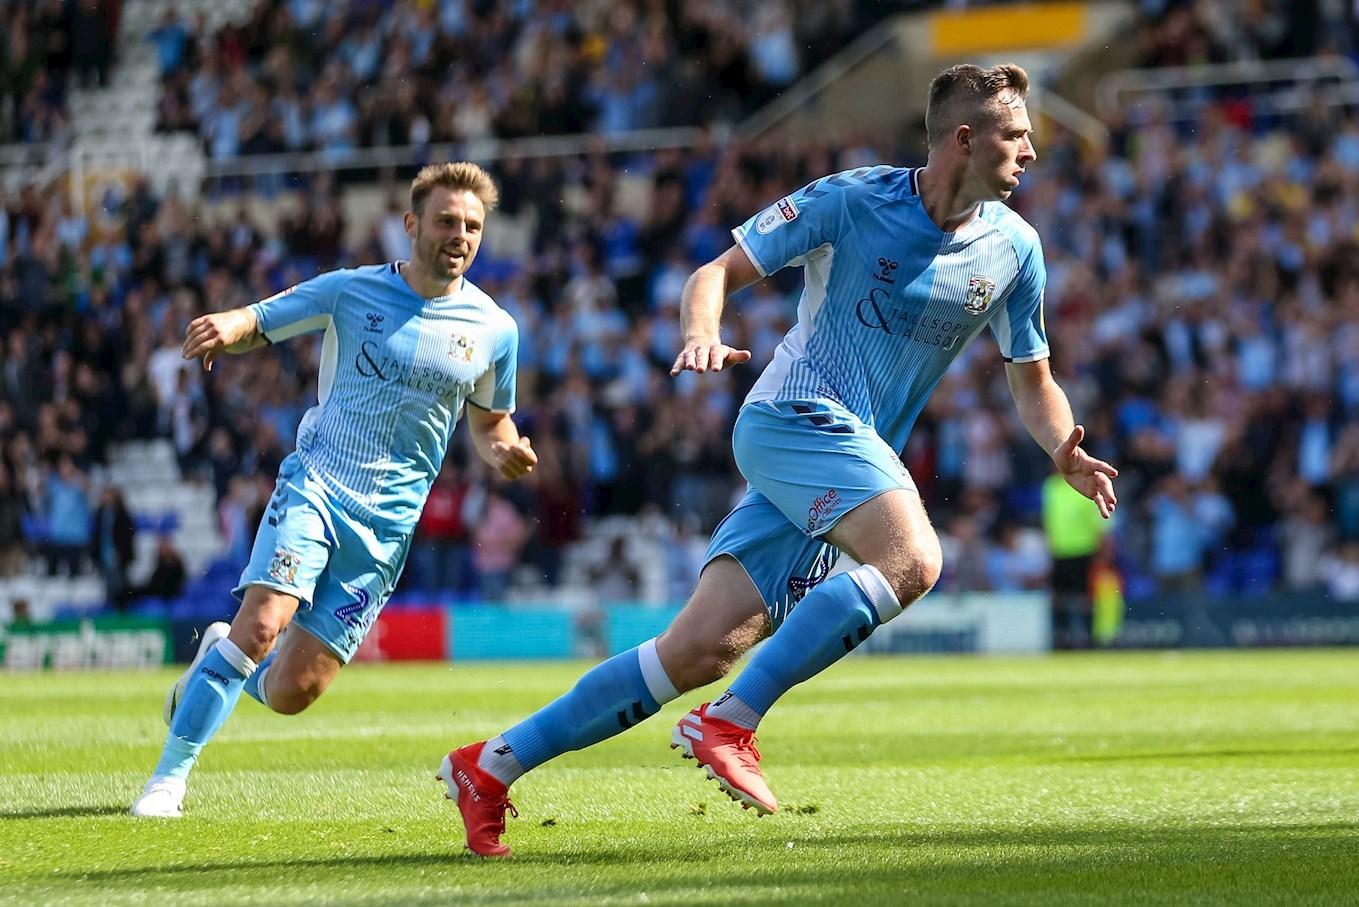 INTERVIEW: Jordan Shipley Bristol Rovers Reaction